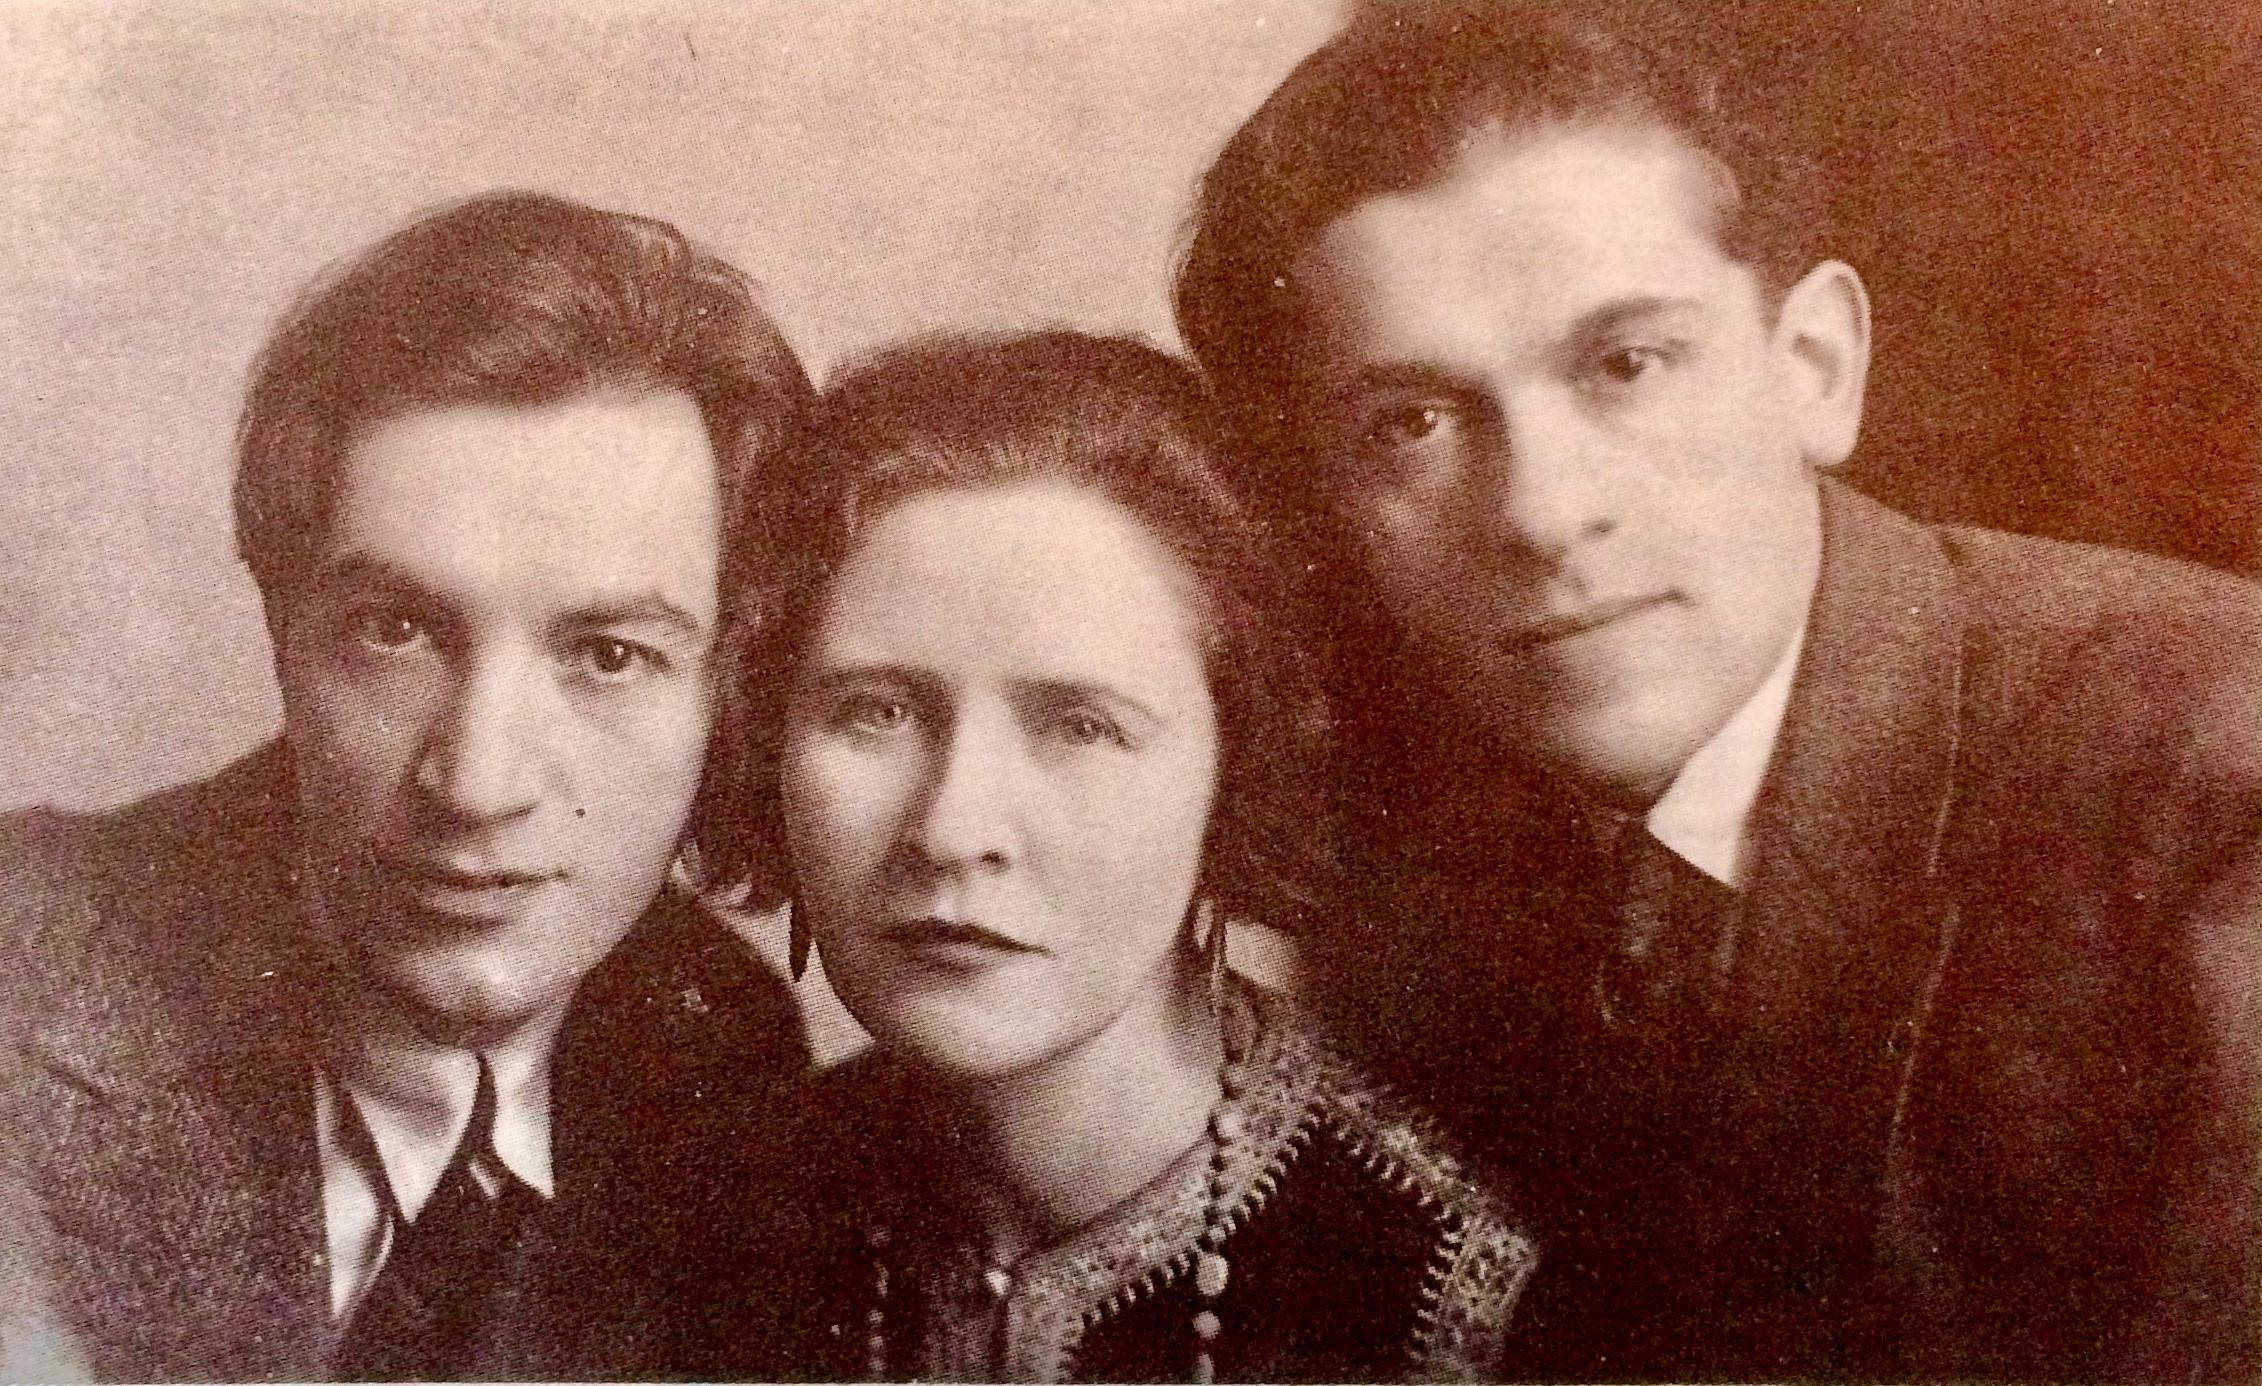 <p>Moyshe Broderzon, Hannah Rovinah, and Hertz Grosbard. Rovinah brought this photo to their reunion at Habimah in 1955. (© M.&nbsp;Tsanin).</p>